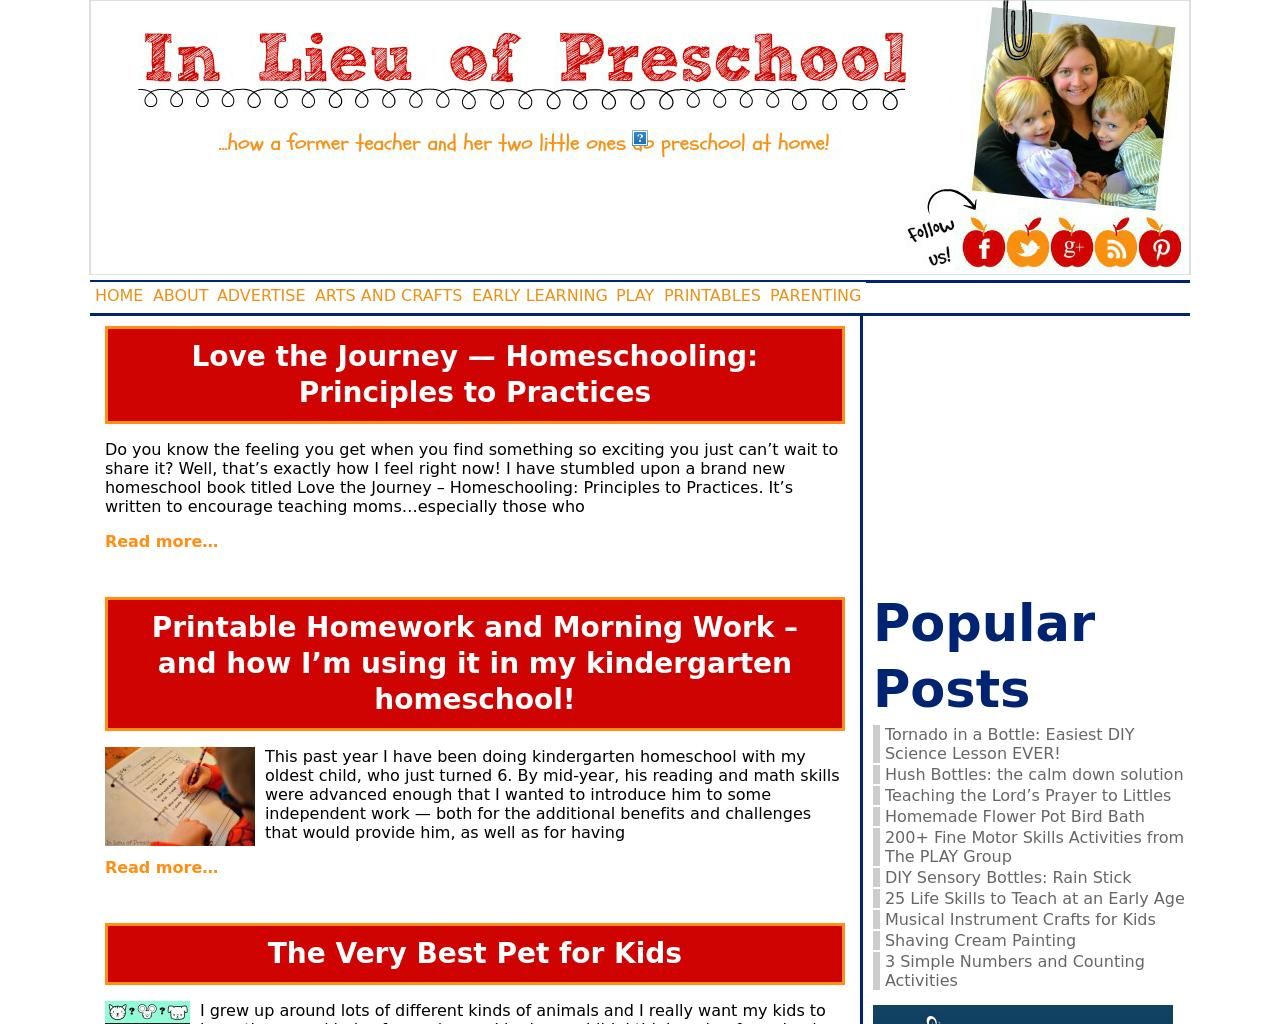 In-Lieu-Of-Preschool-Advertising-Reviews-Pricing